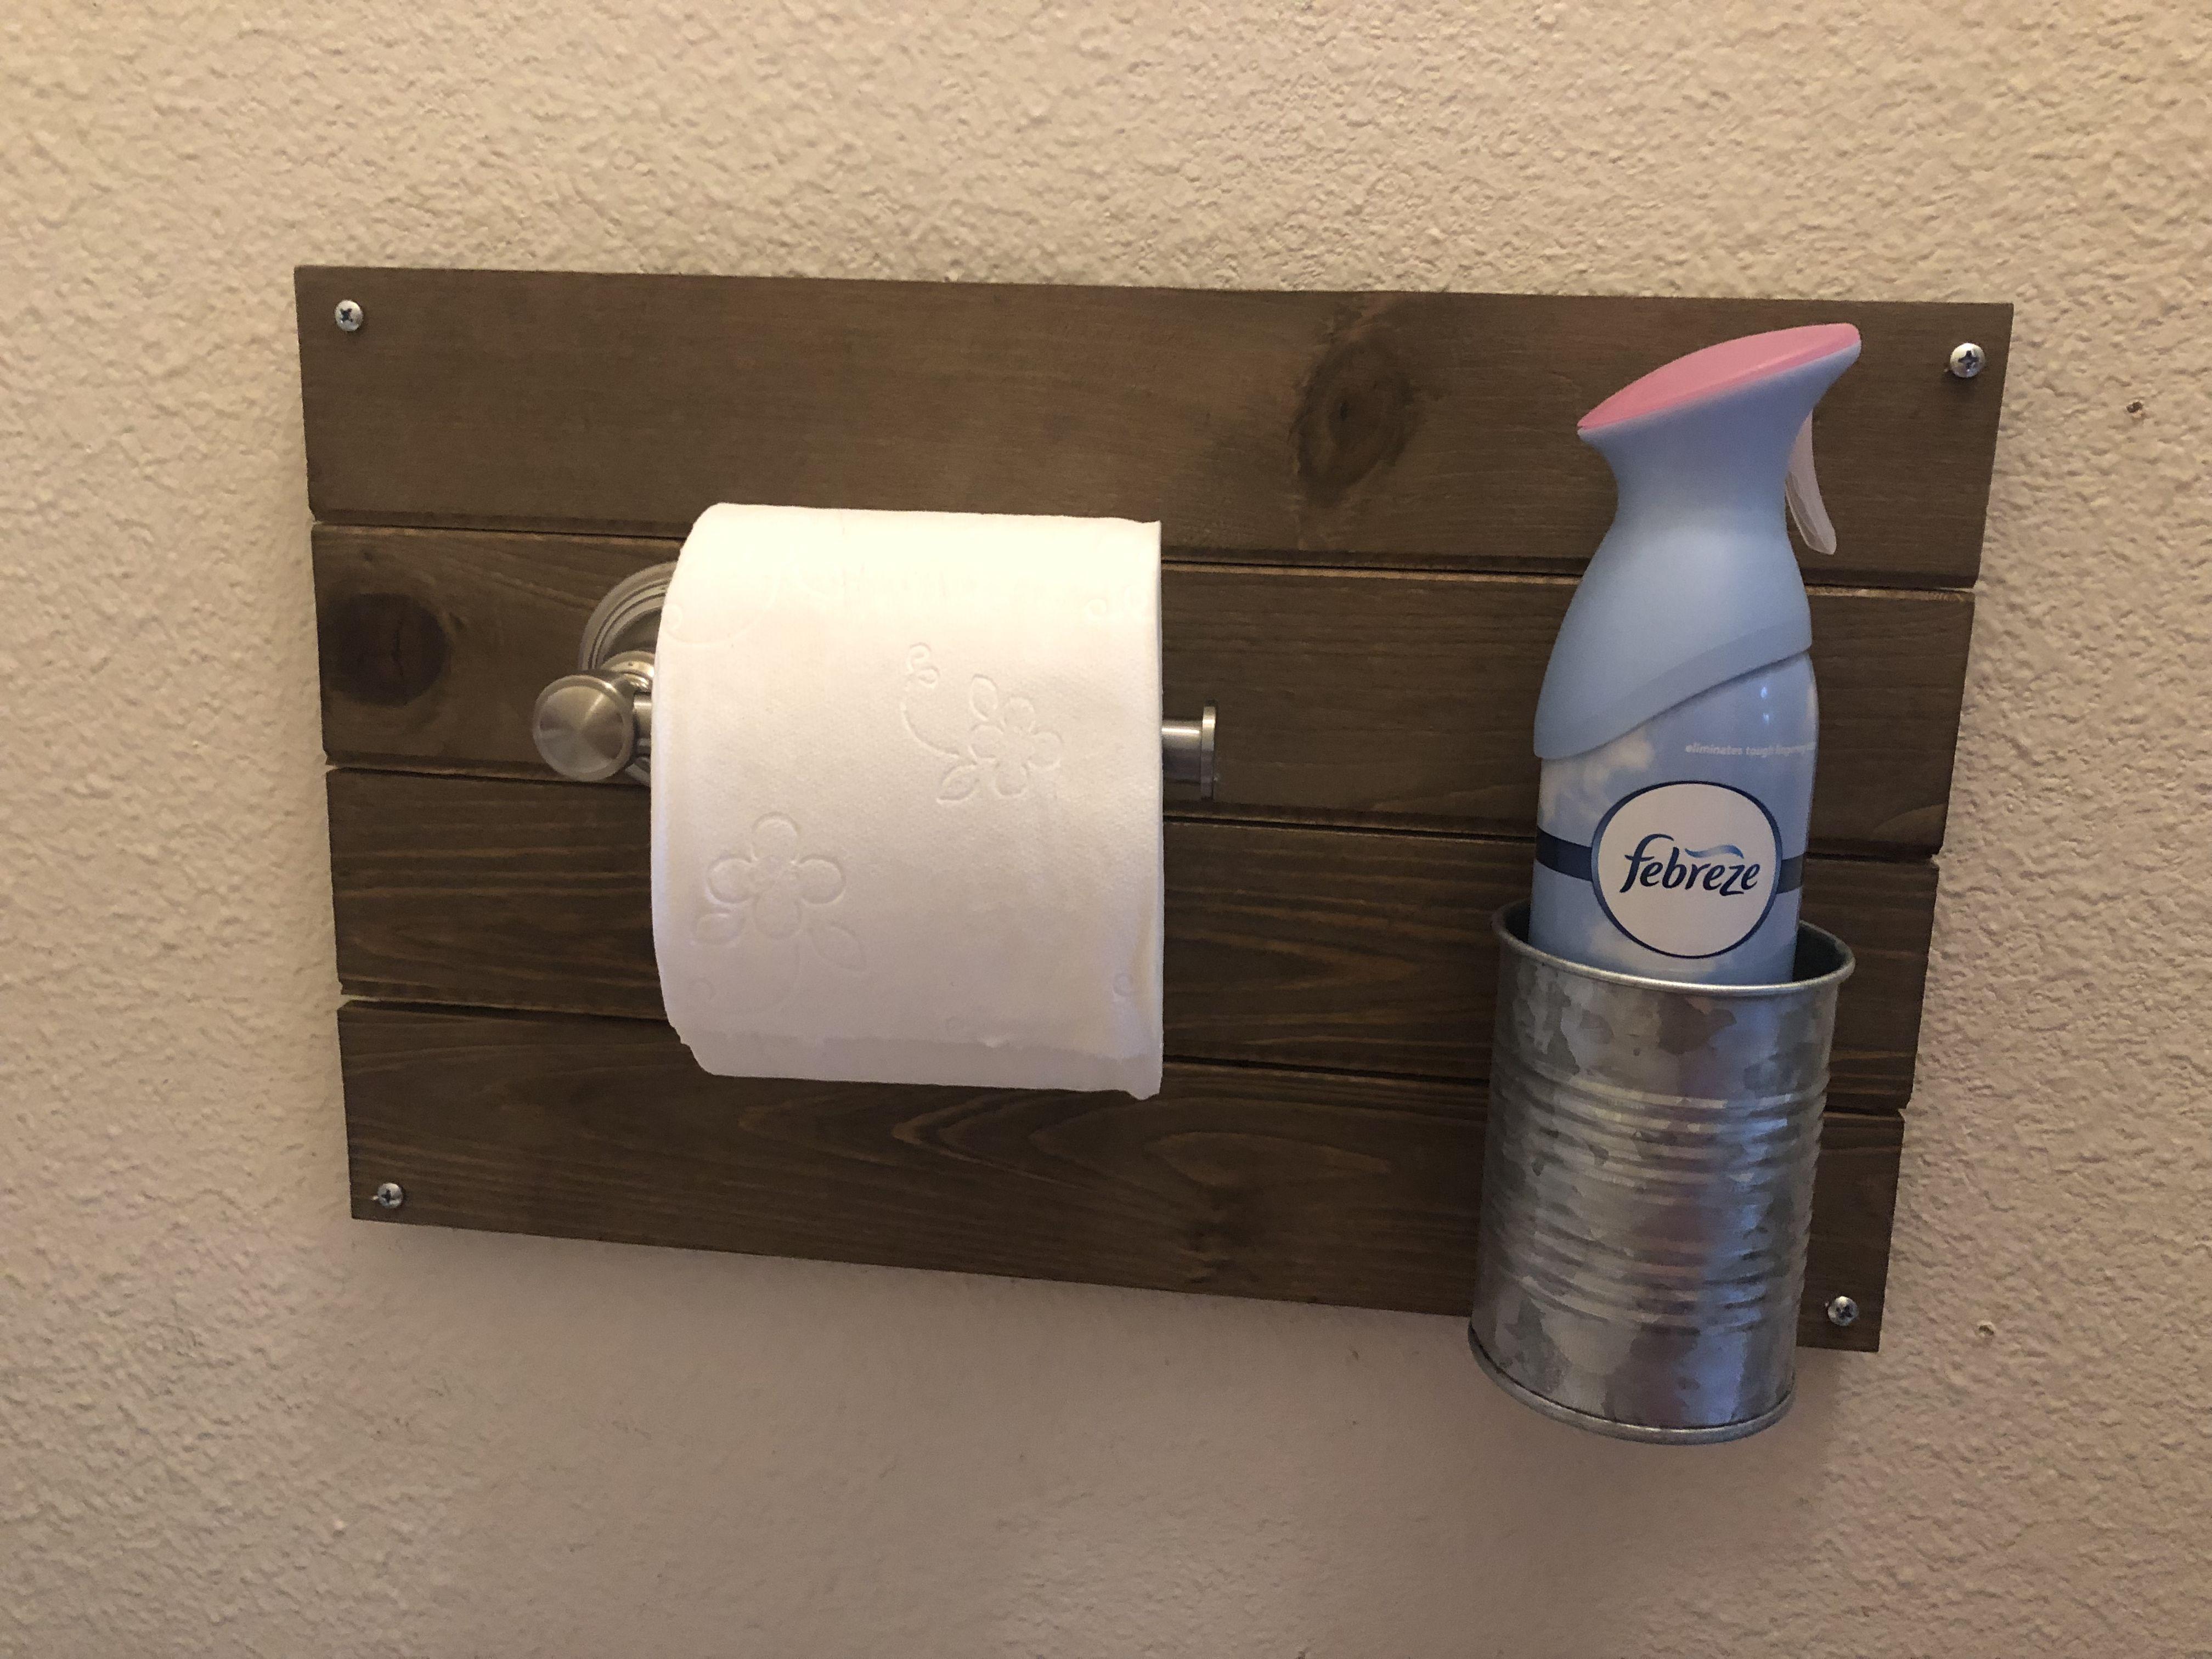 Pin By Lori Grogg On Bathroom Storage Ideas Bathroom Storage Febreze Toilet Paper